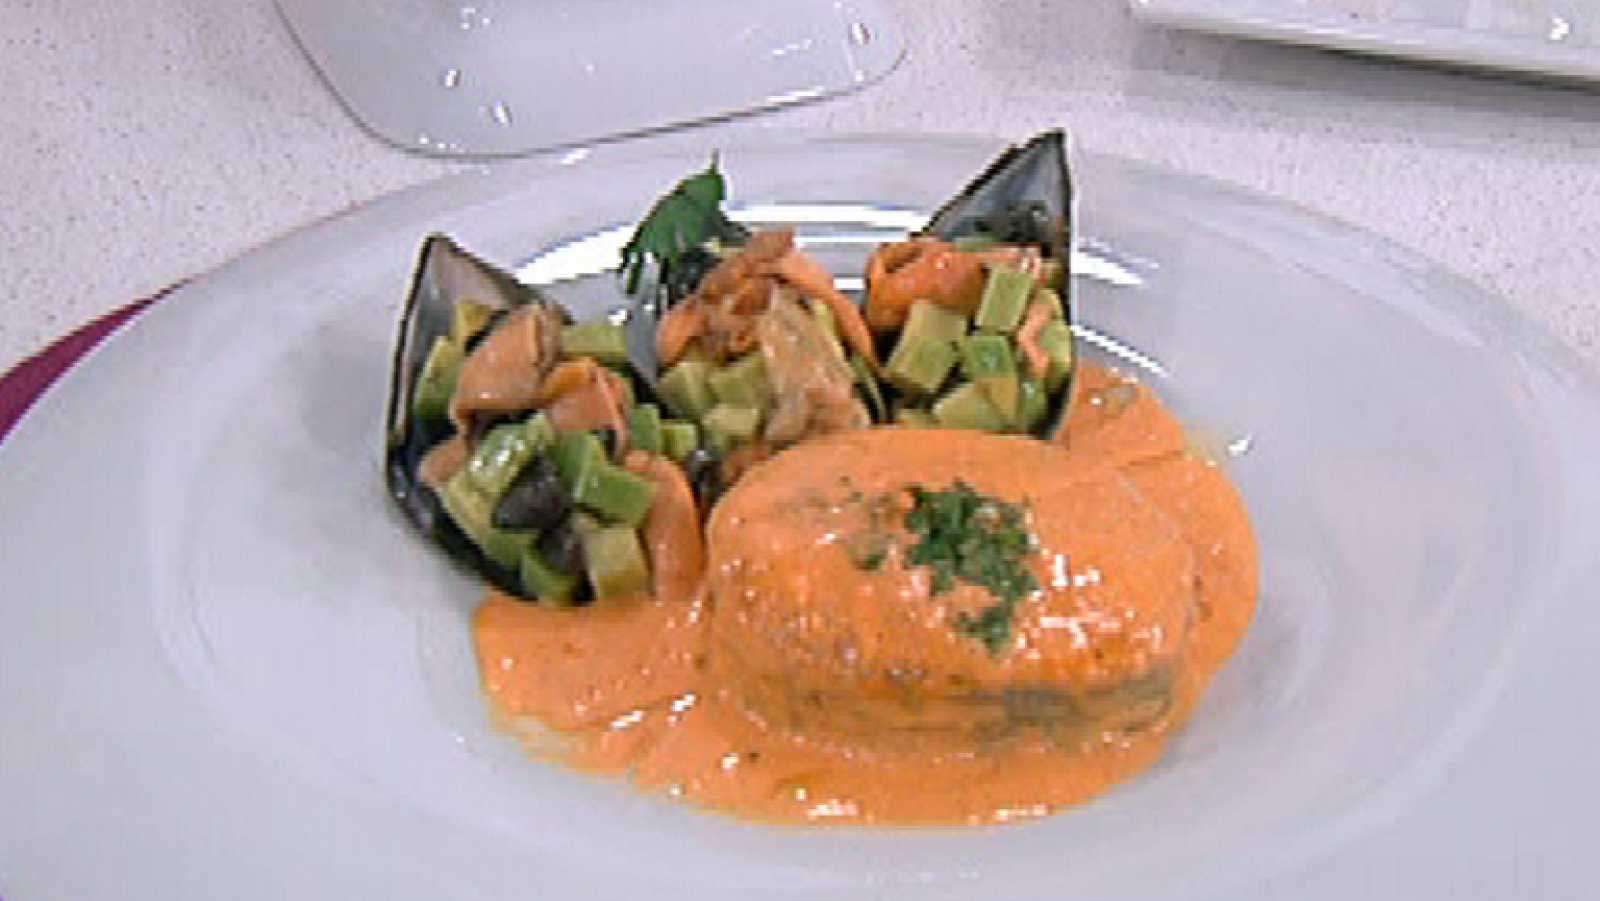 Saber cocinar pescadilla en salsa con mejillones for Cocinar mejillones en salsa